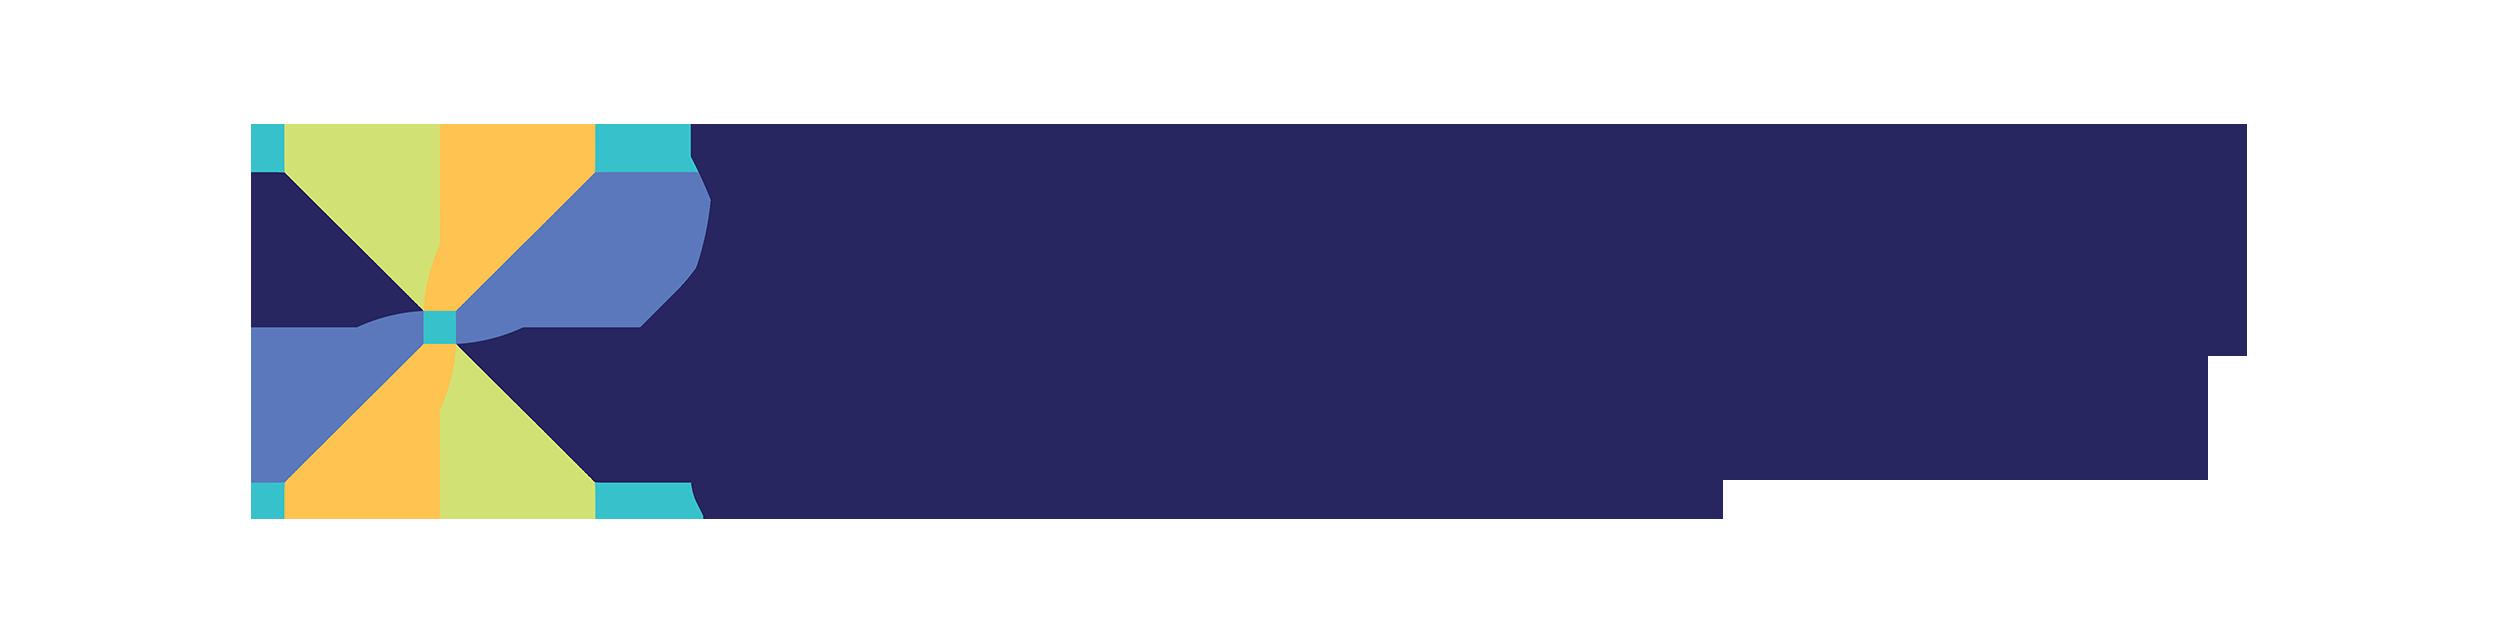 transforming success logo